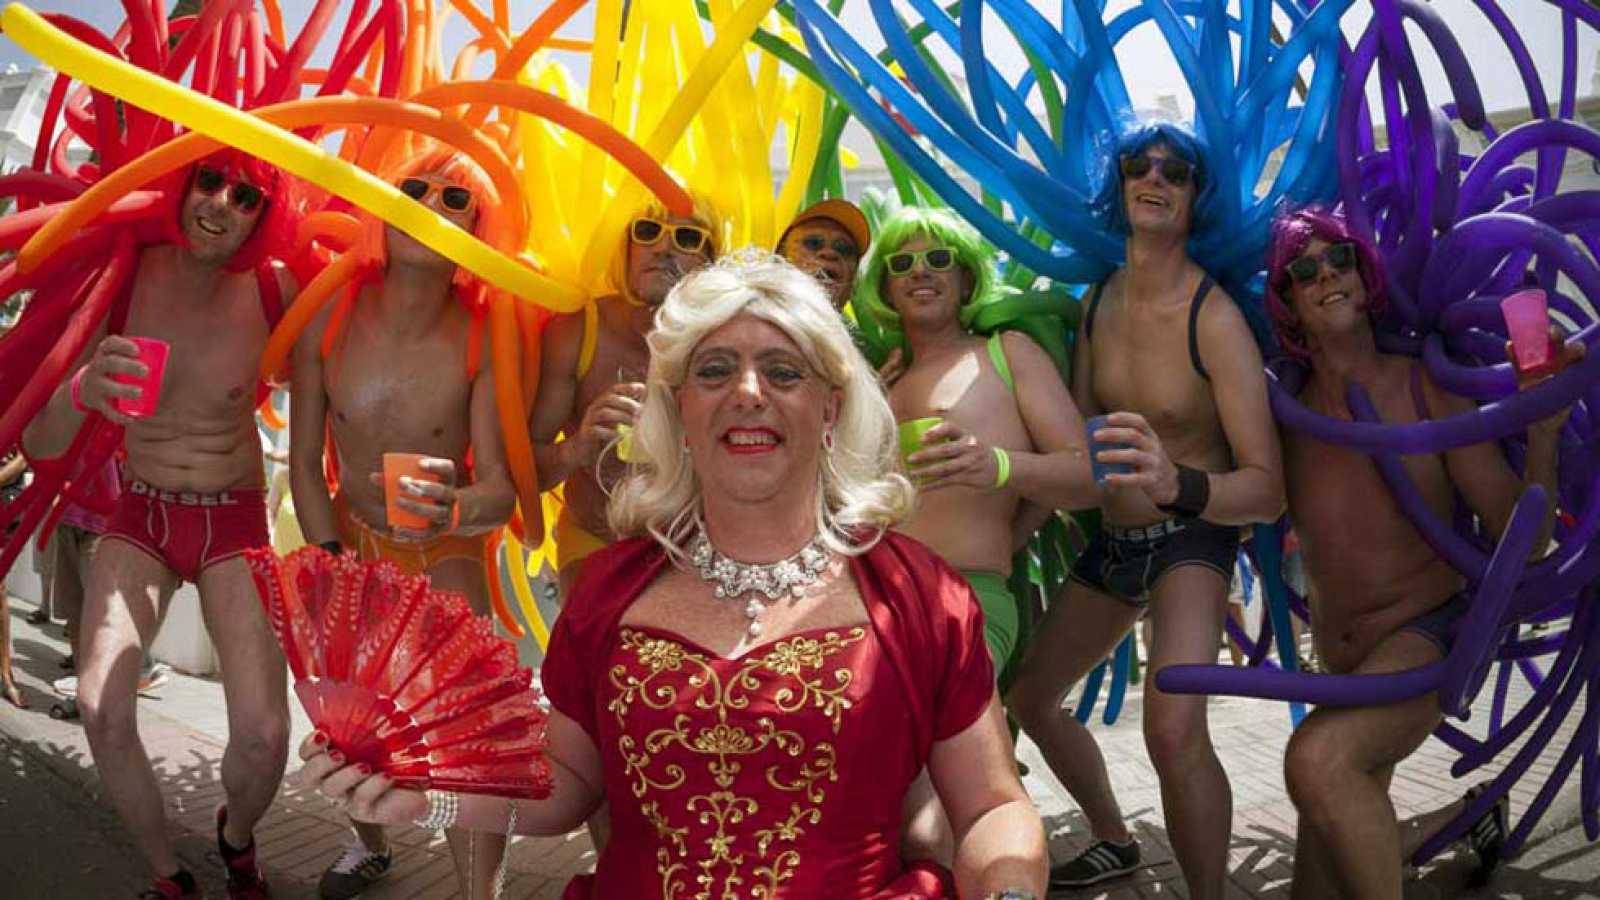 fiesta gay solo tetonas